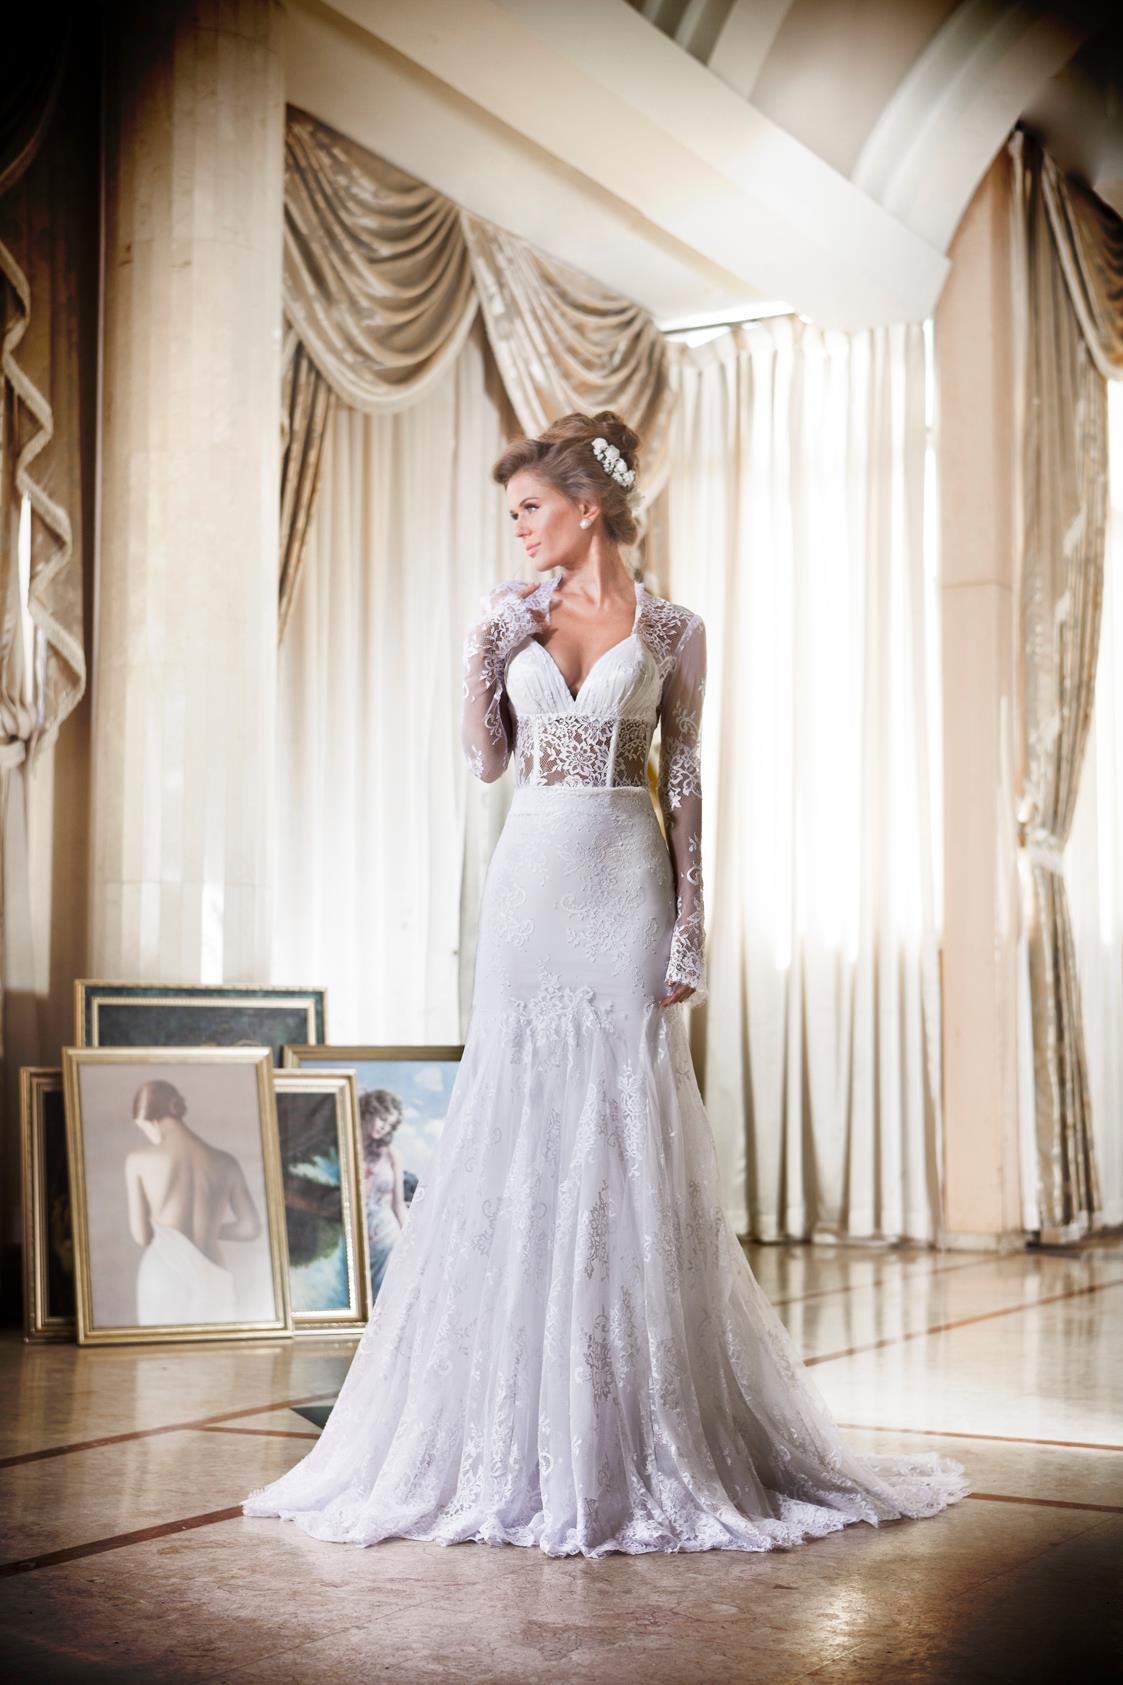 BN Bridal: Liana Haute Couture - 2013/2014 Collection - BellaNaija